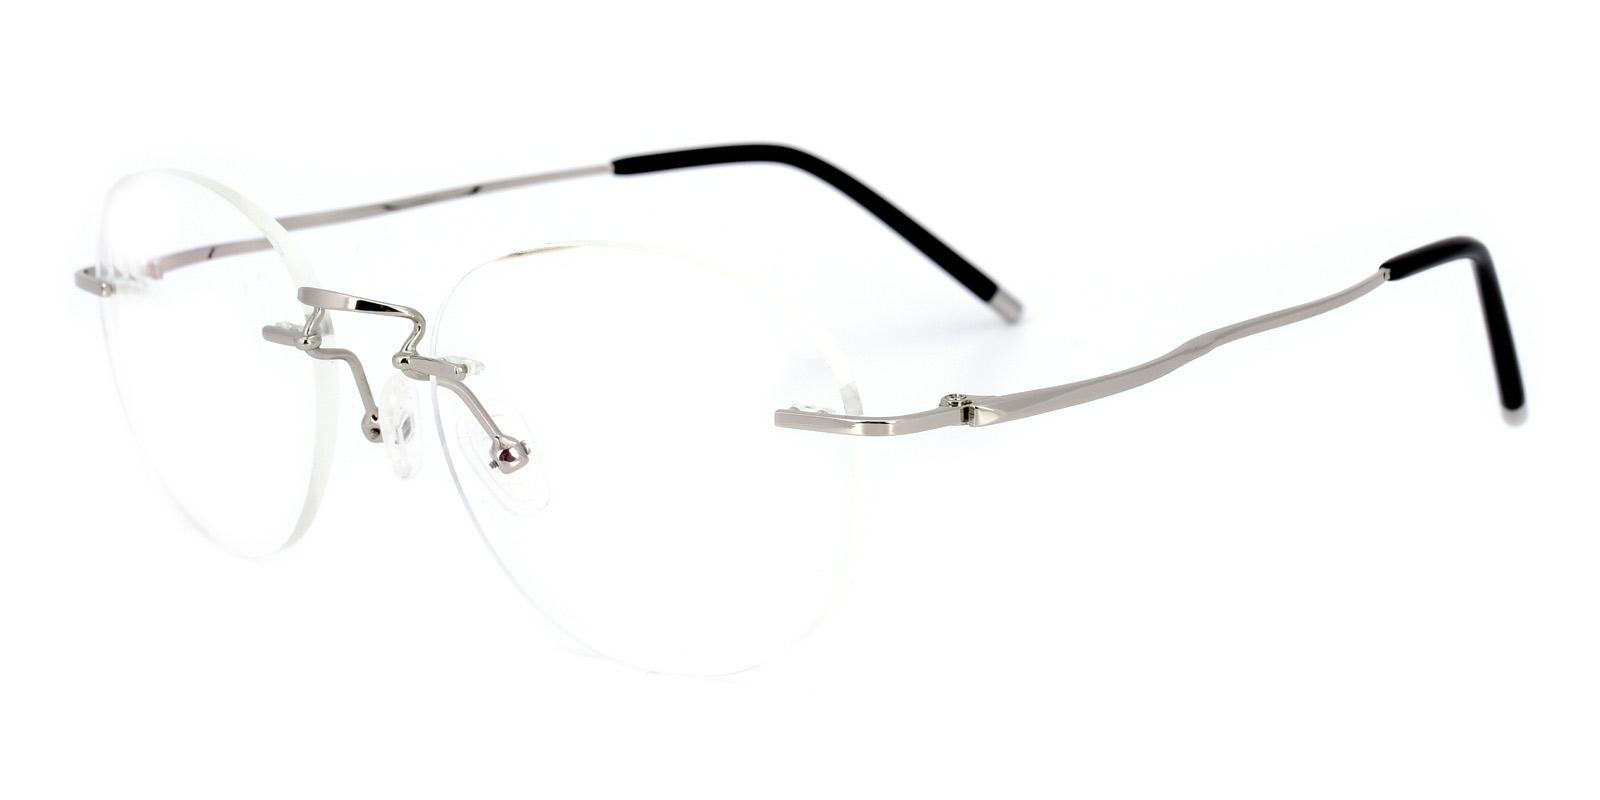 Pandimo-Silver-Varieties-Titanium-Eyeglasses-additional1